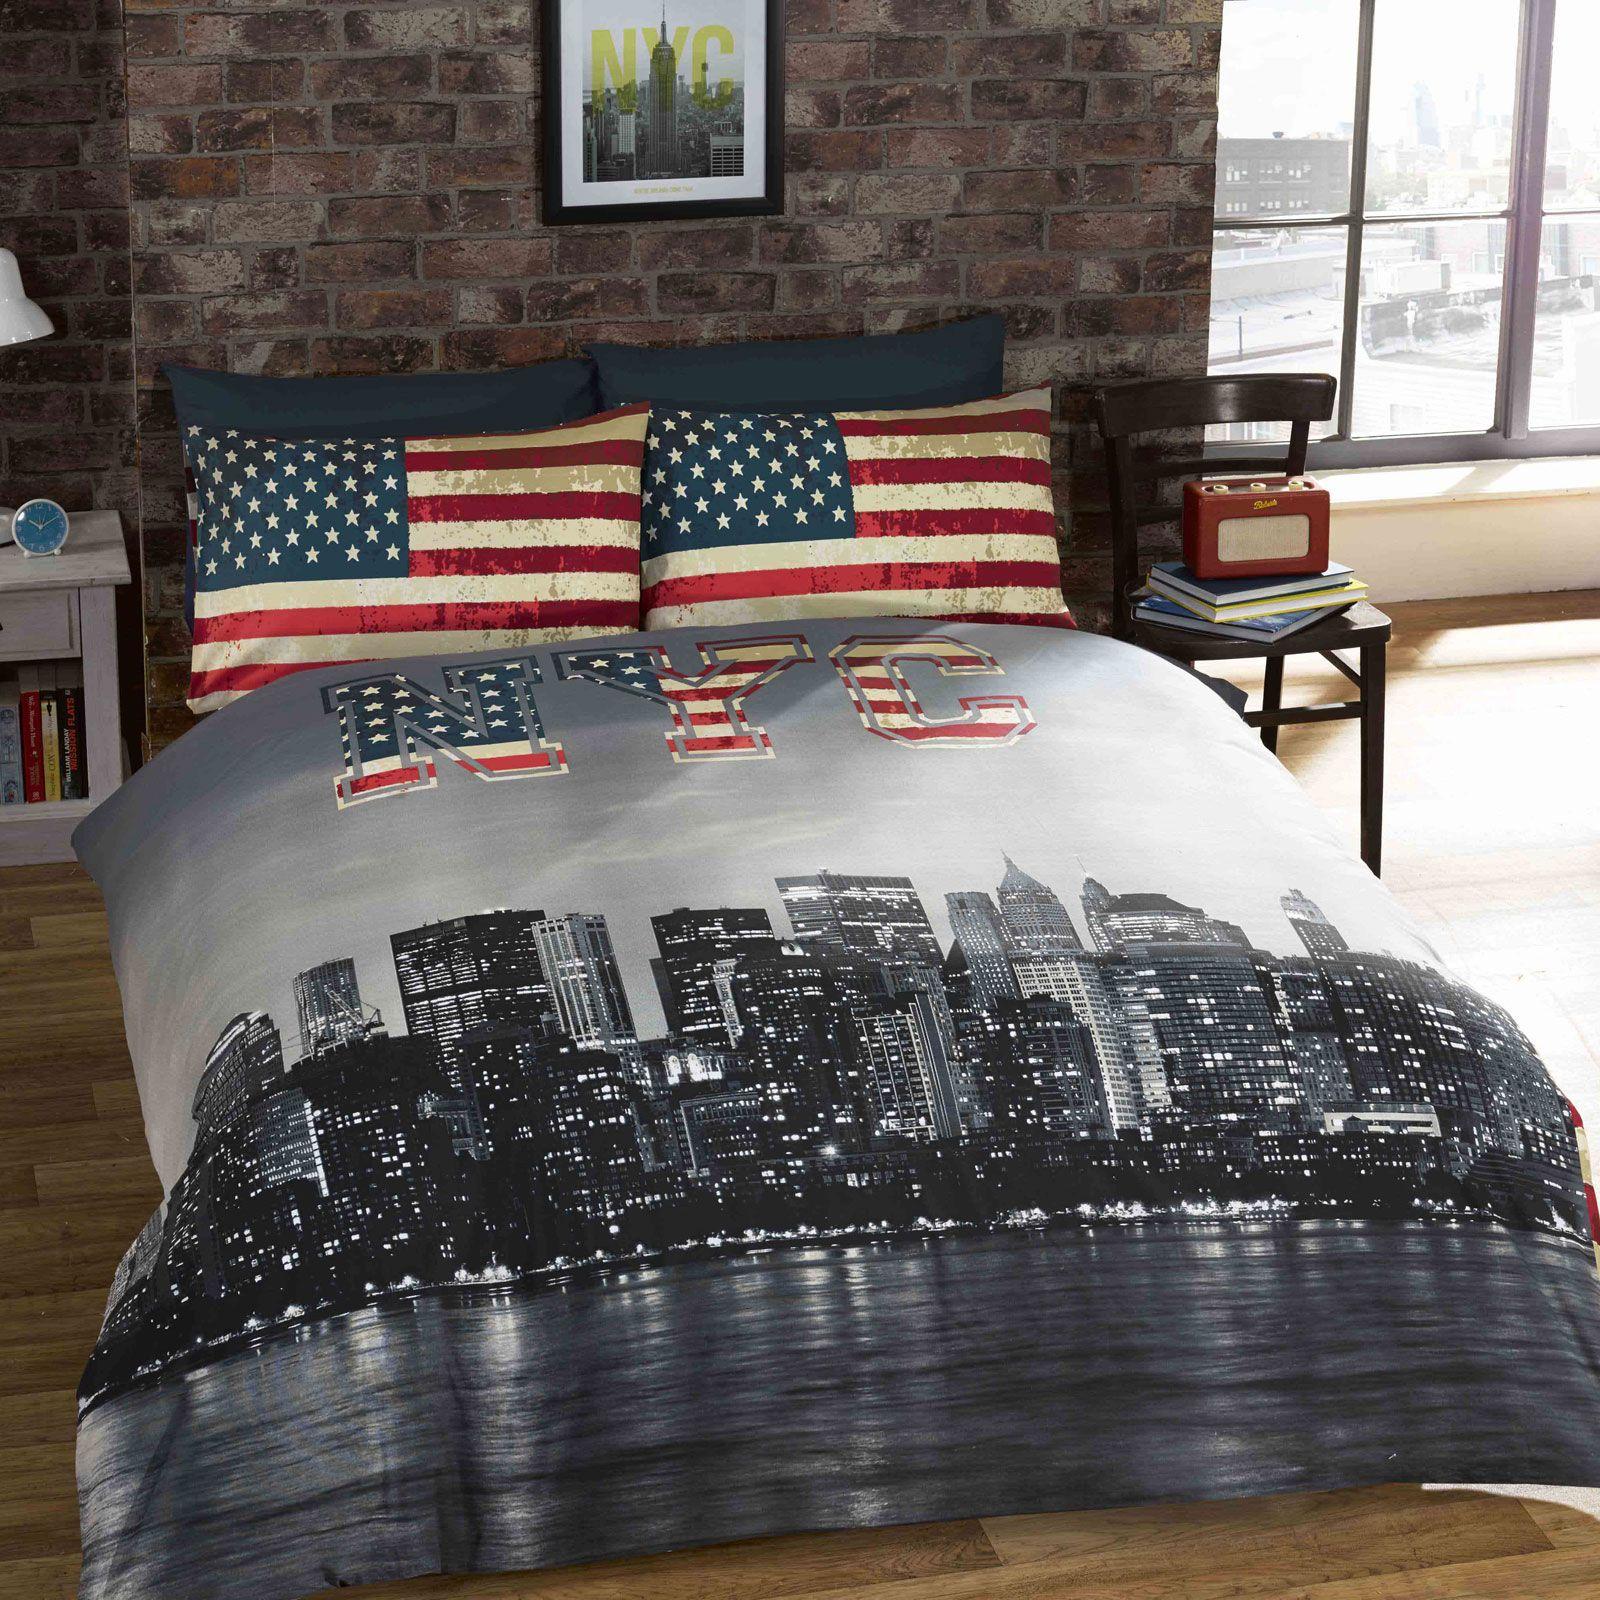 New-York-PROFILO-NYC-citta-bandiera-USA-Set-copripiumino-reversibile